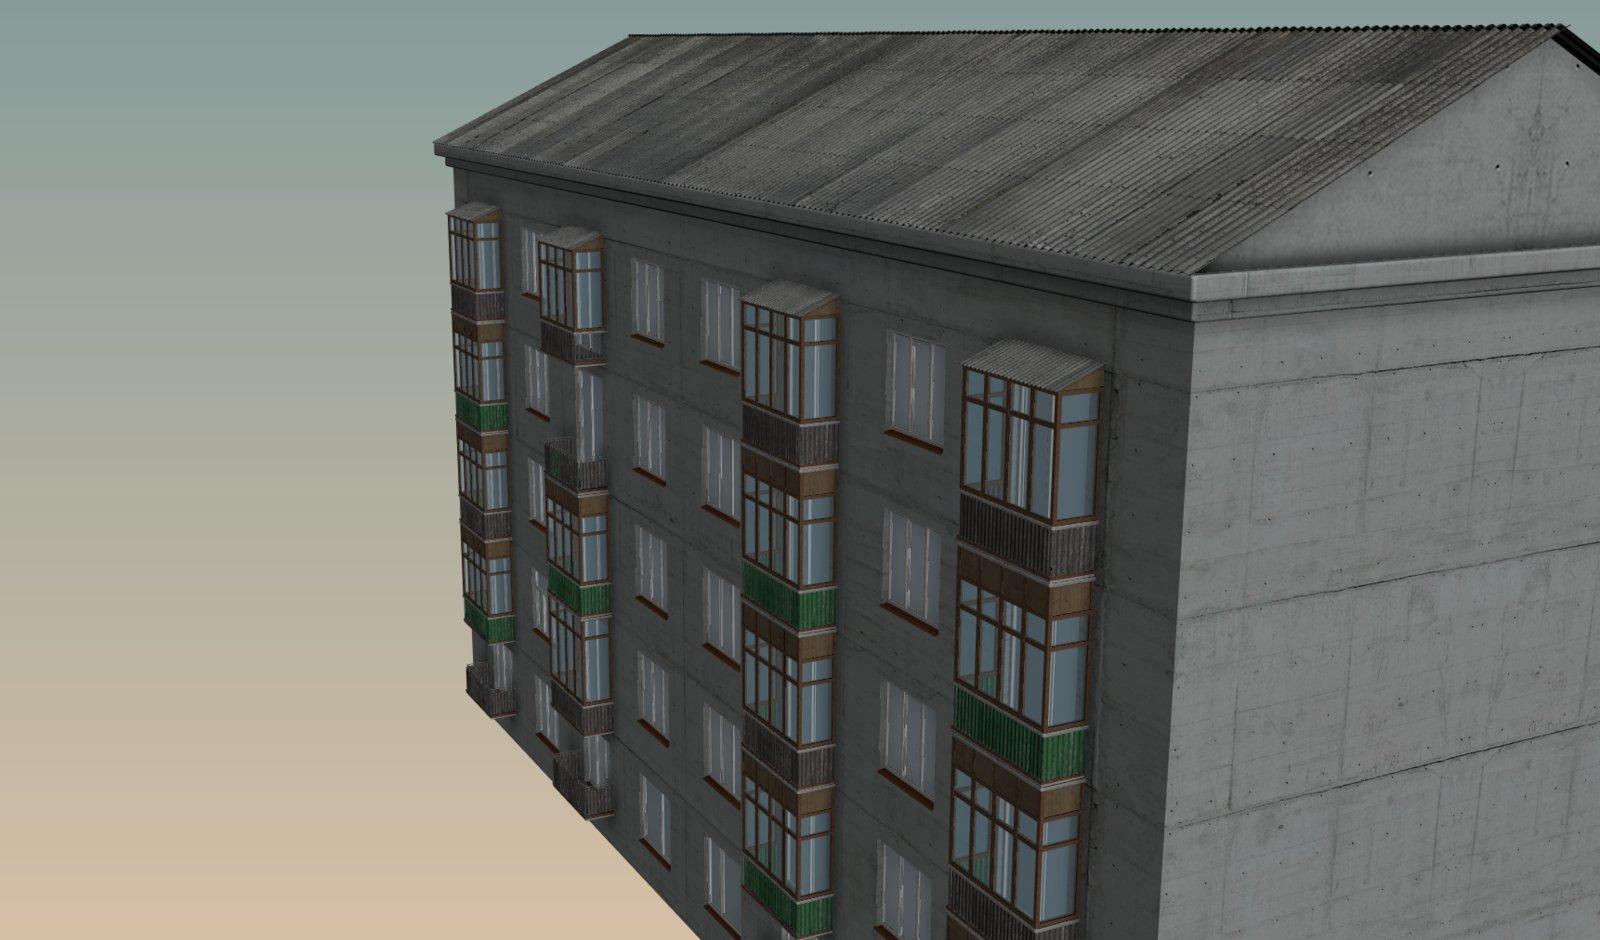 Assets #1: Background Building